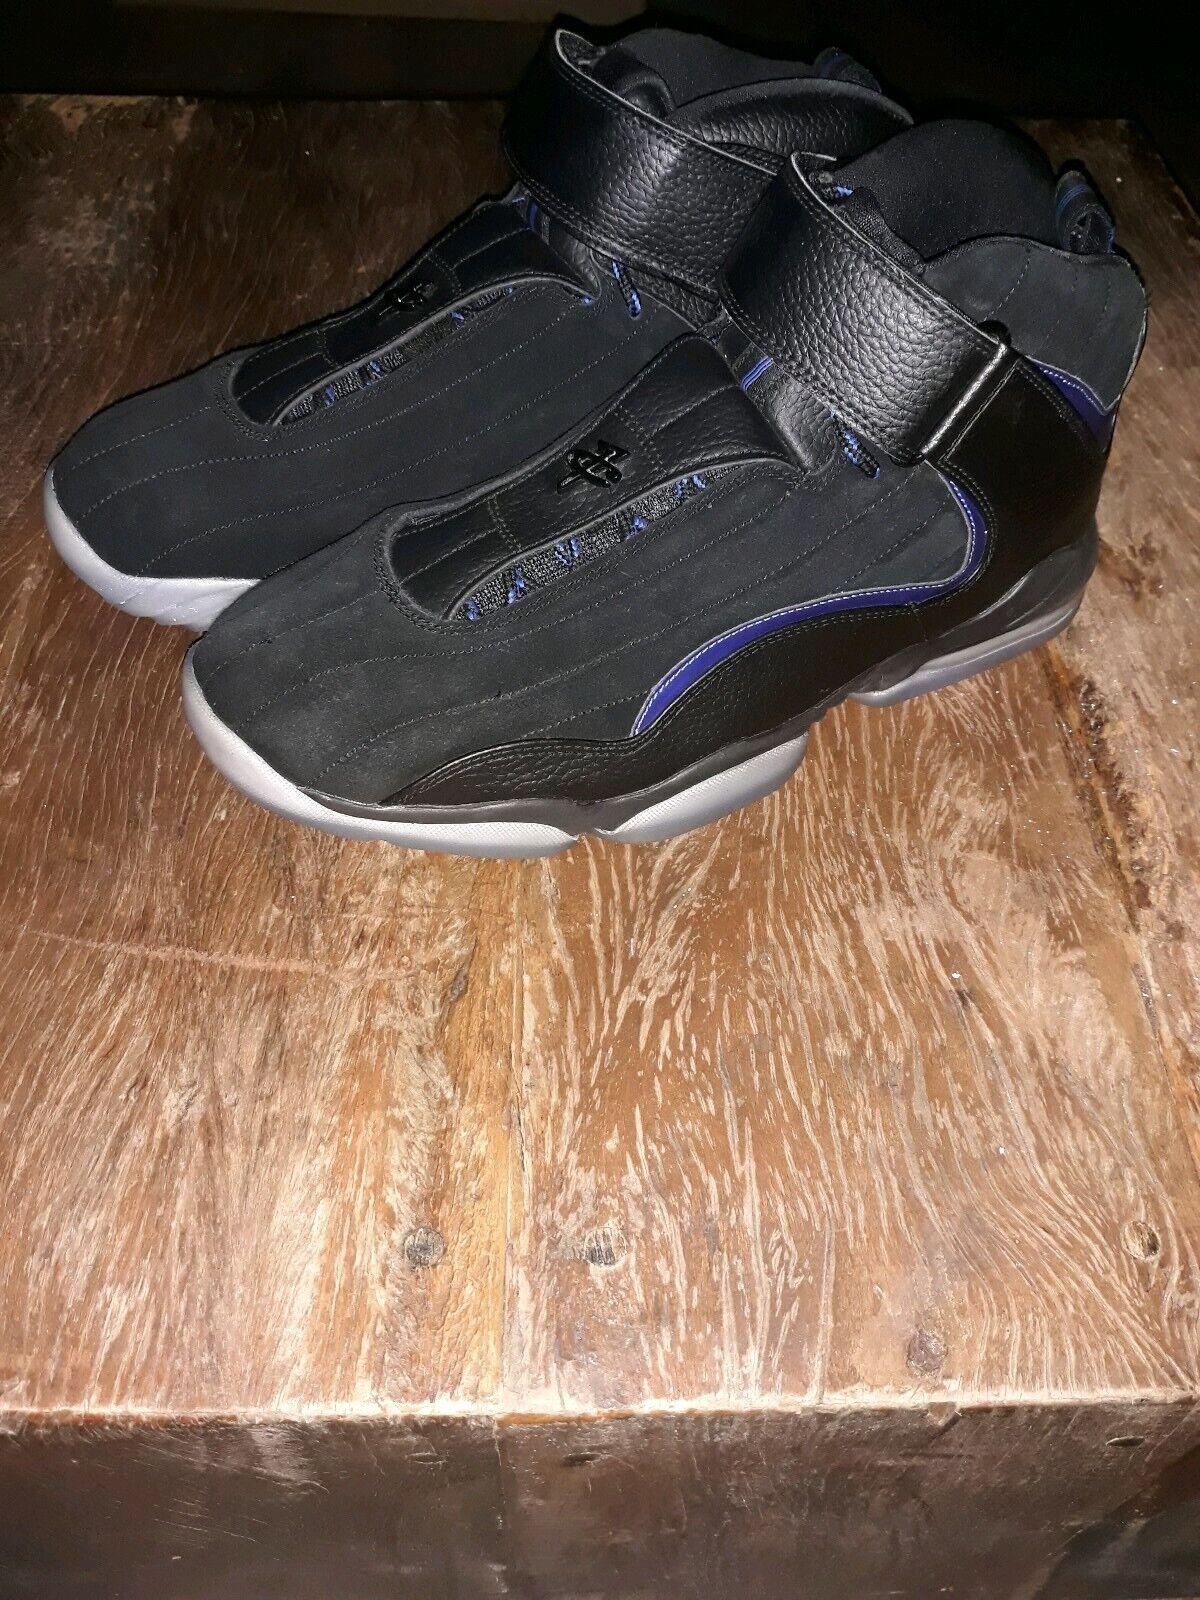 low priced 2d307 ec8b6 Mens Nike Air Penny IV Size Size Size 12 e3de4a